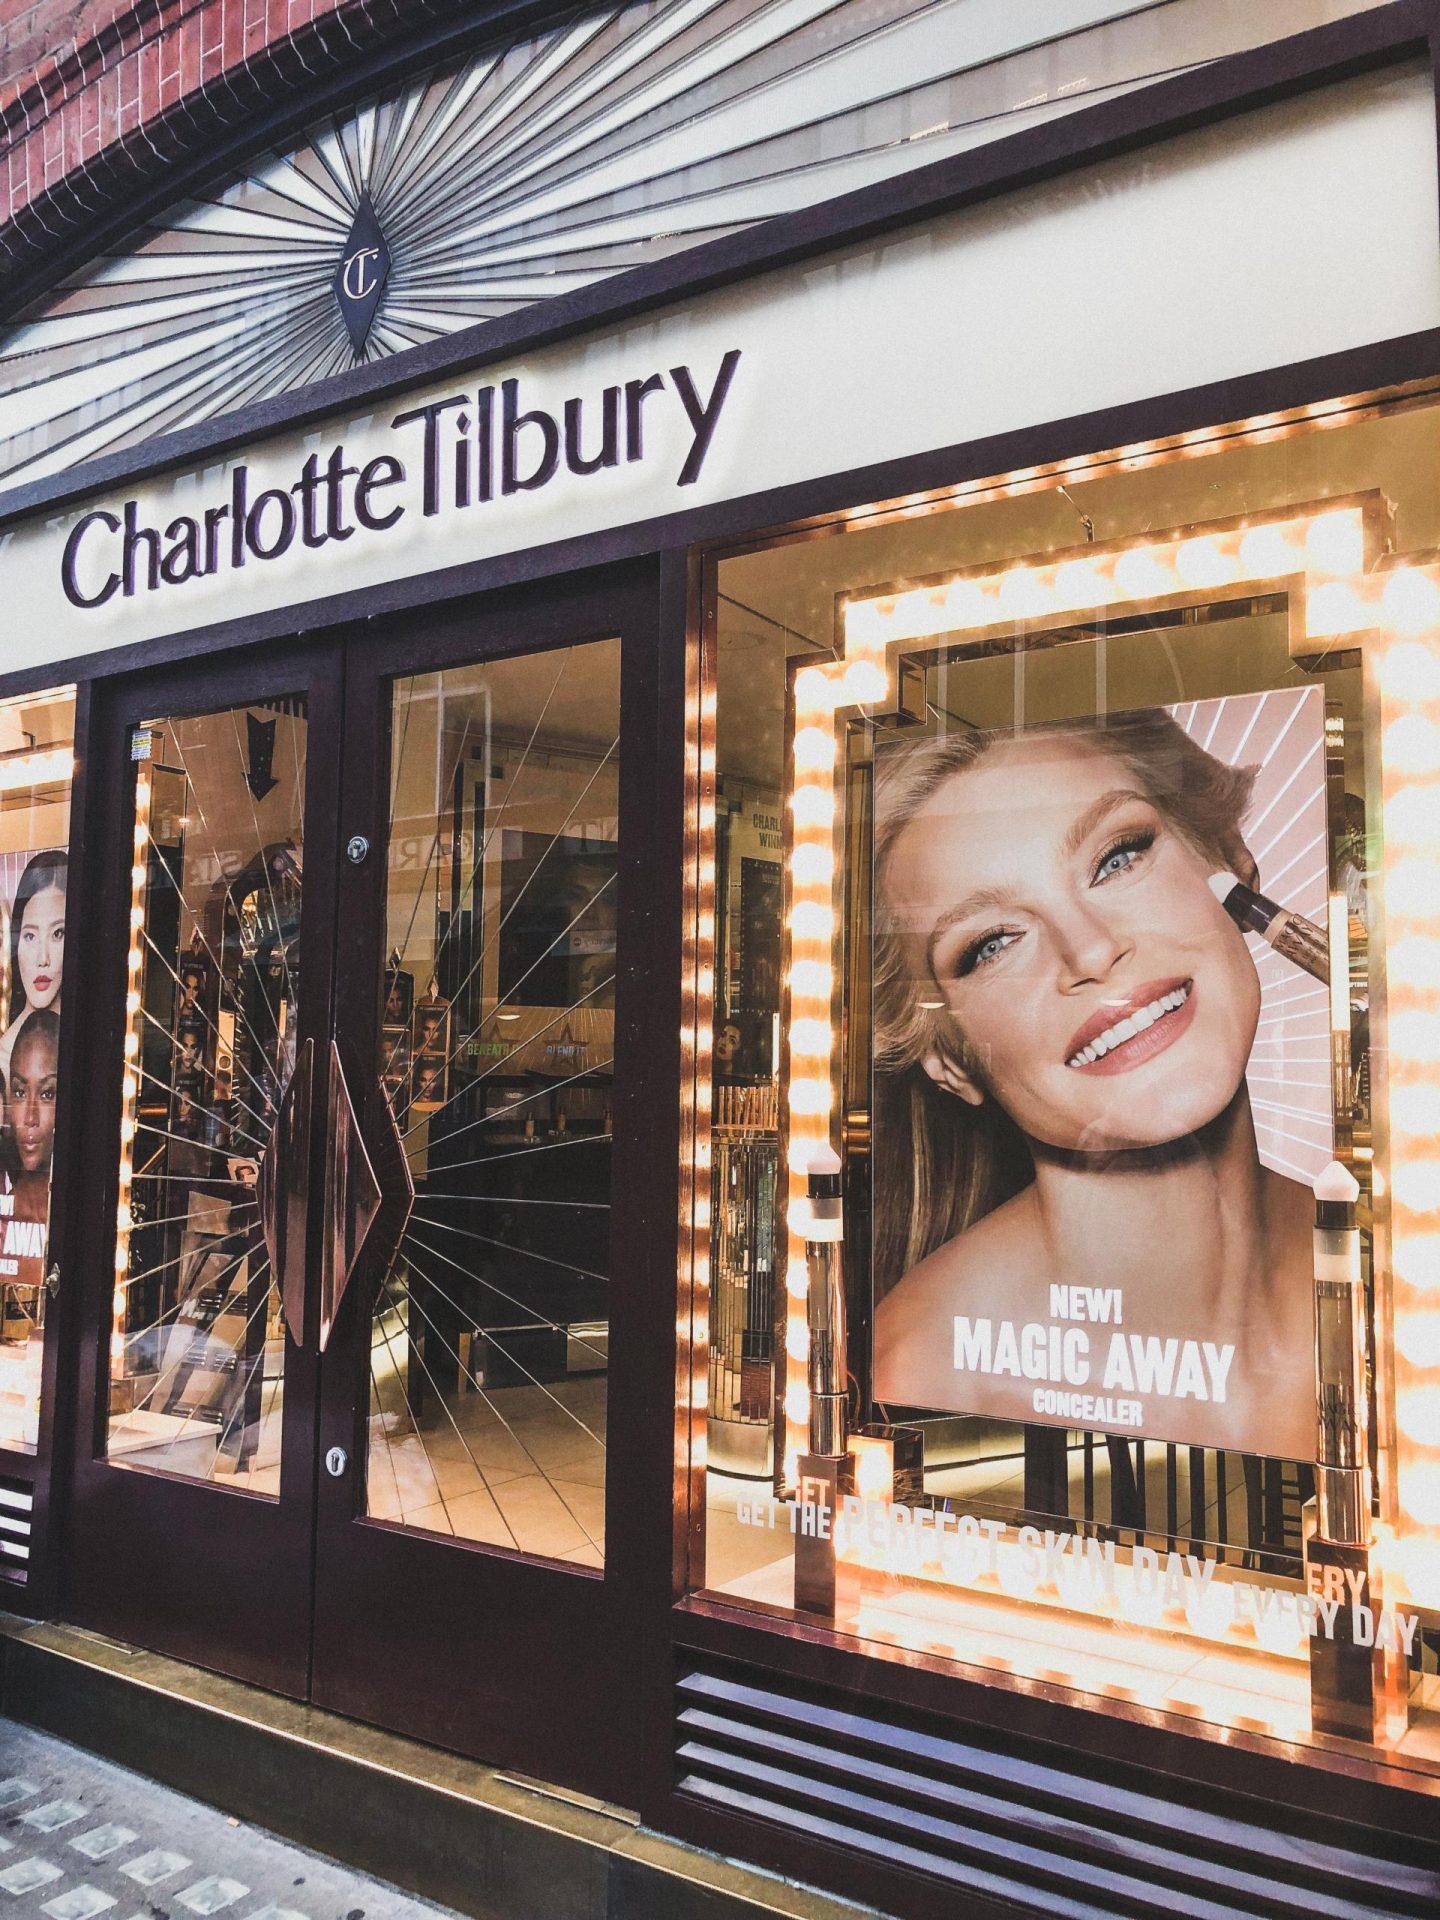 Exploring Covent Garden with Hotels.com, Charlotte Tilbury - Rachel Nicole UK Blogger